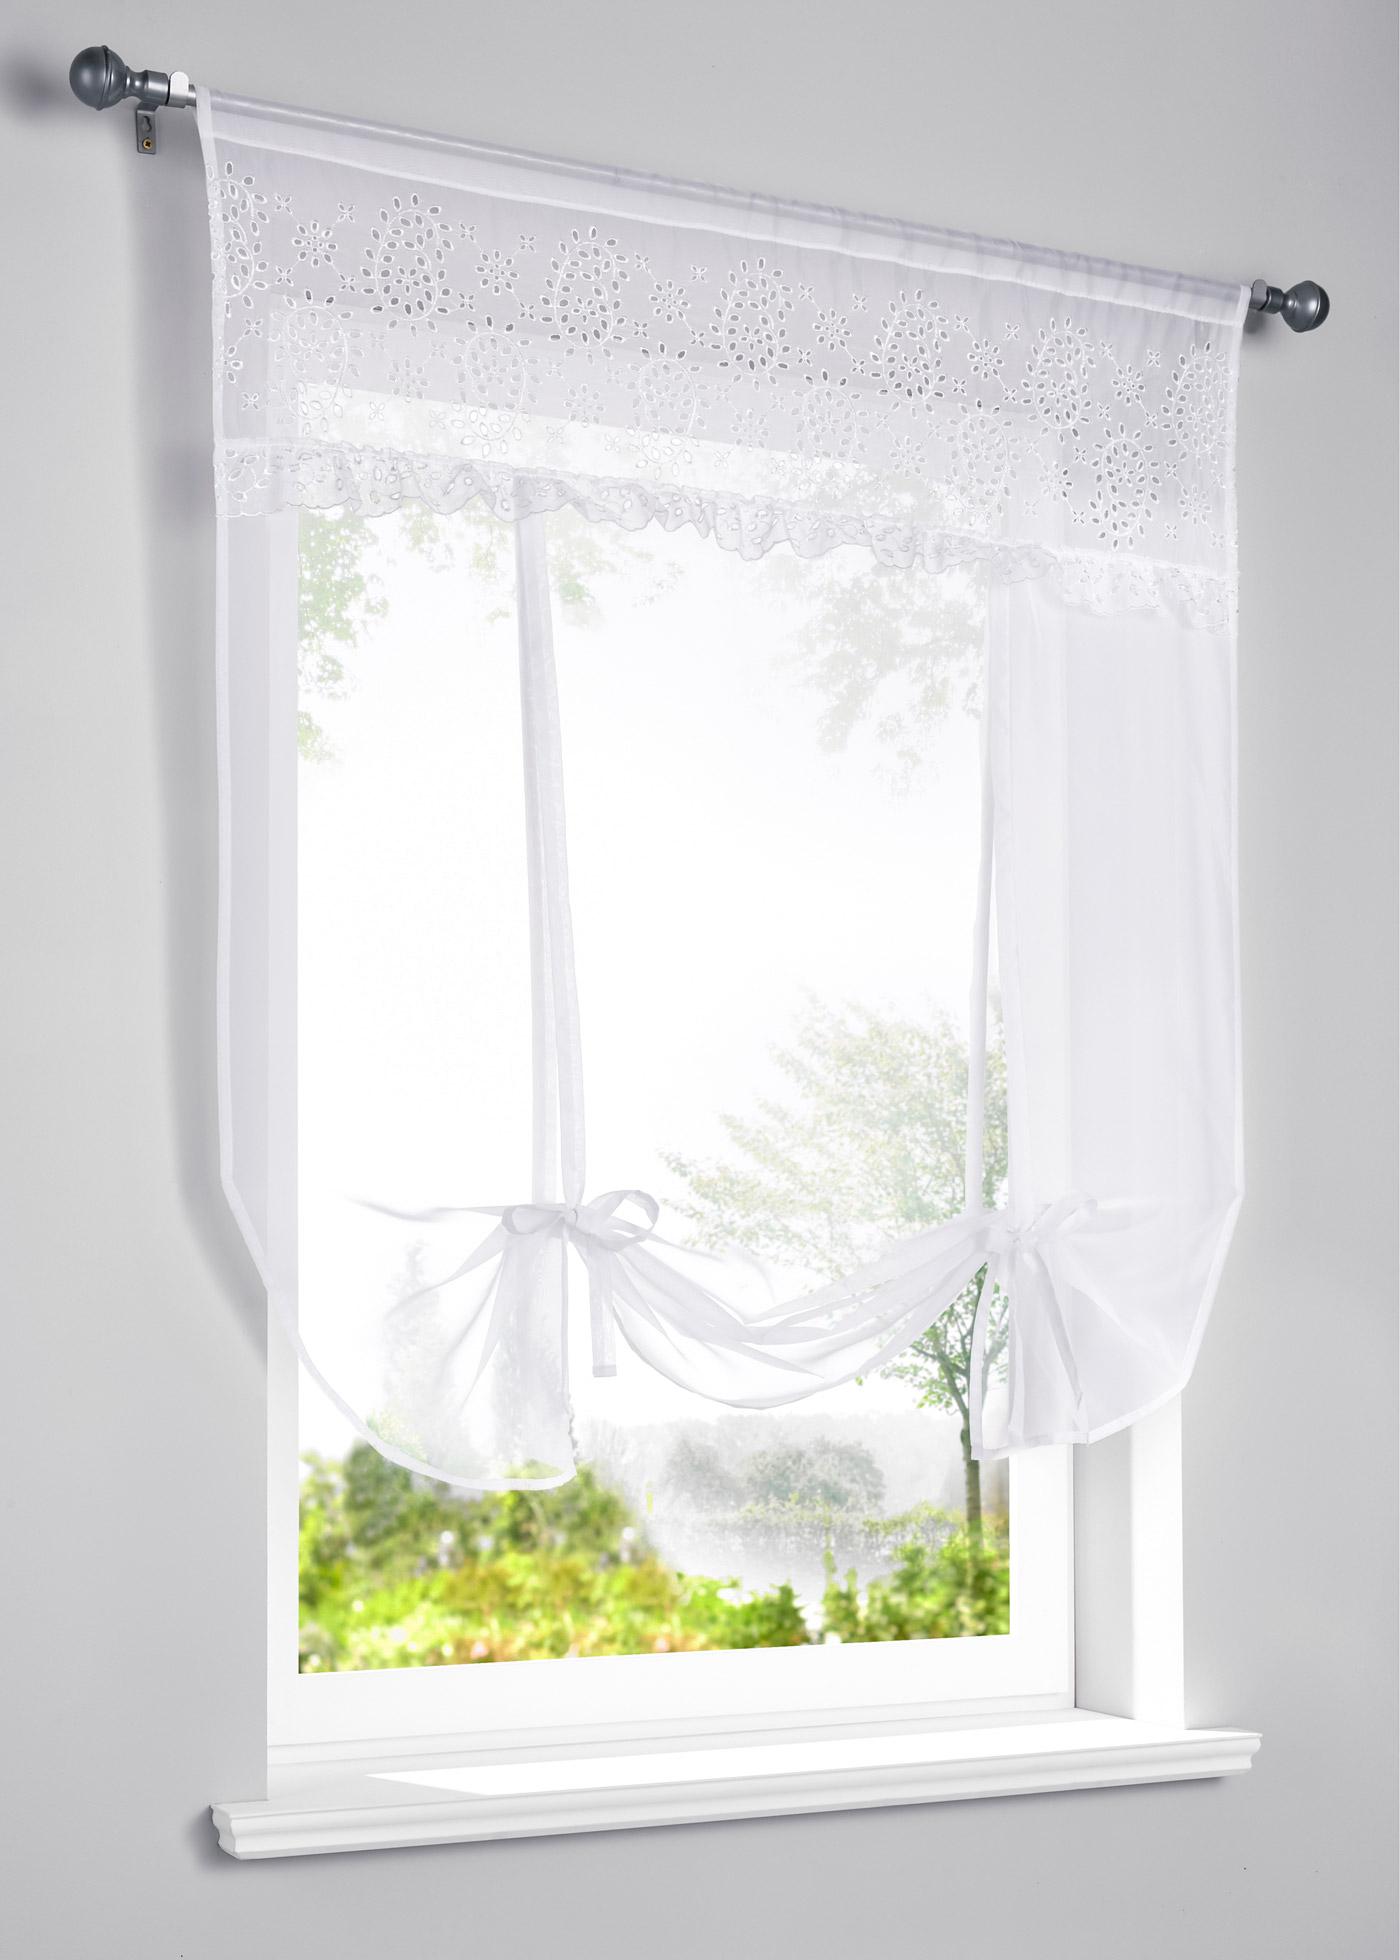 Transparent, dimensions = dimensions du tissu.